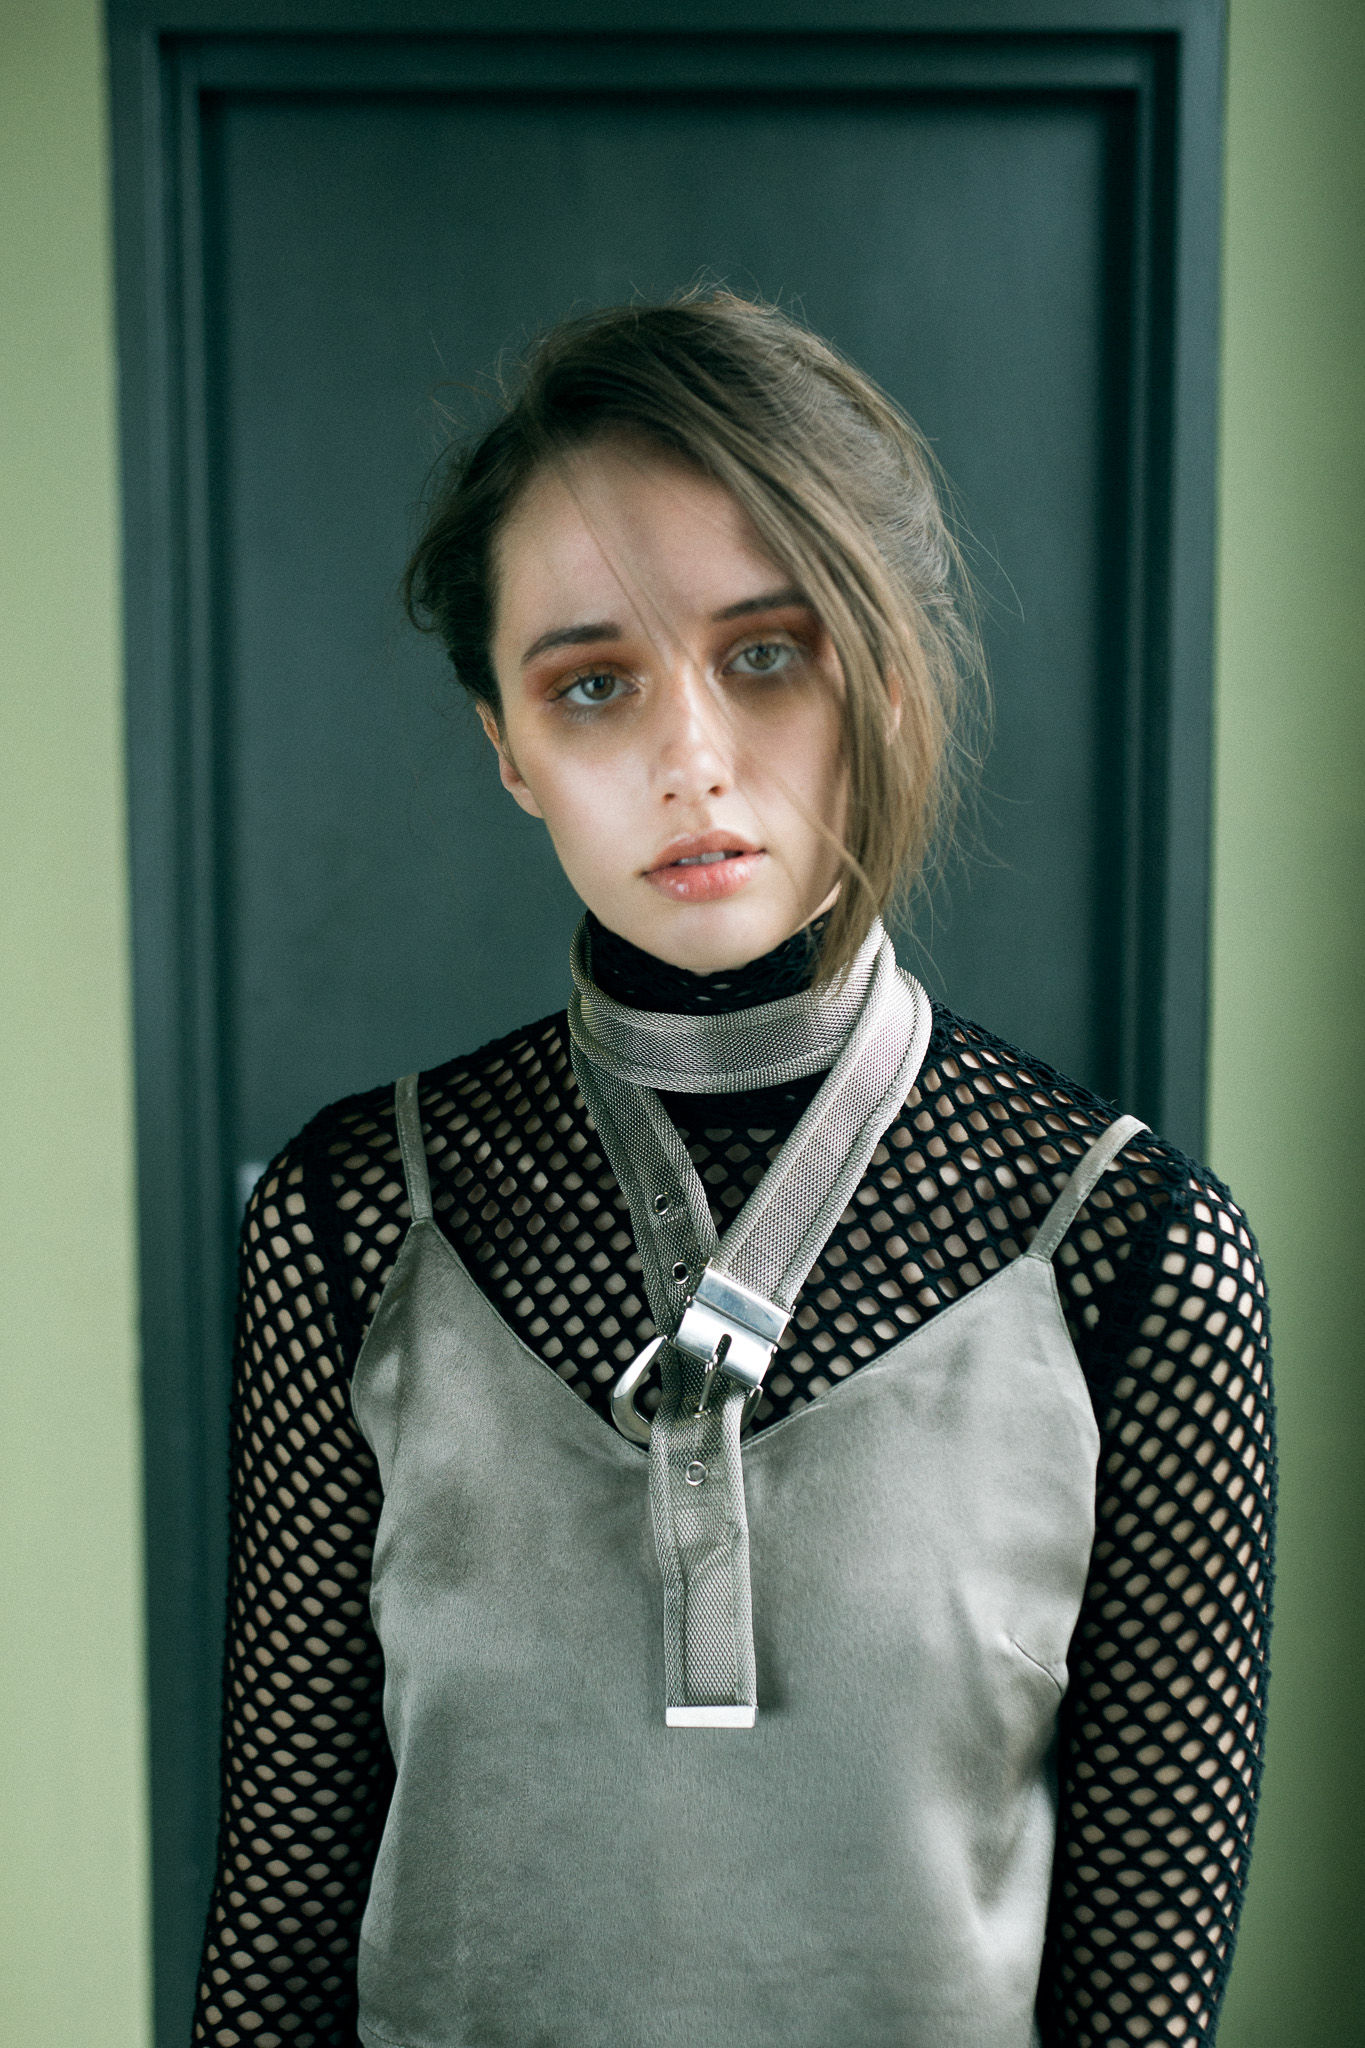 georgia quinn model beauty portrait beauty fashion photography melbourne australia commercial_-47.jpg